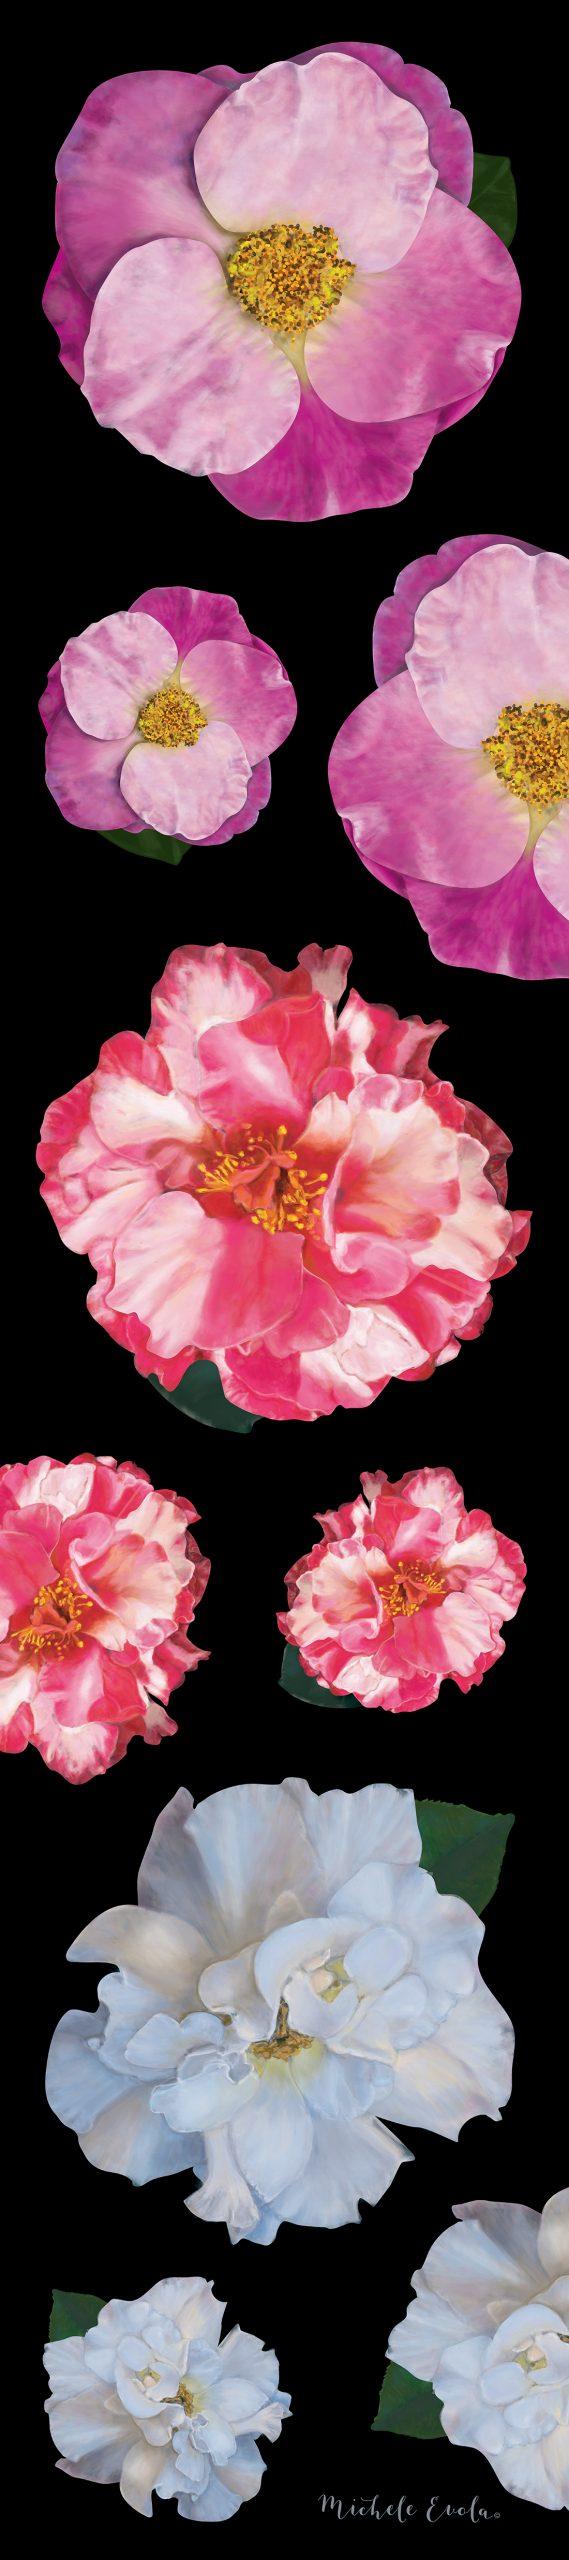 Camellia Scarf